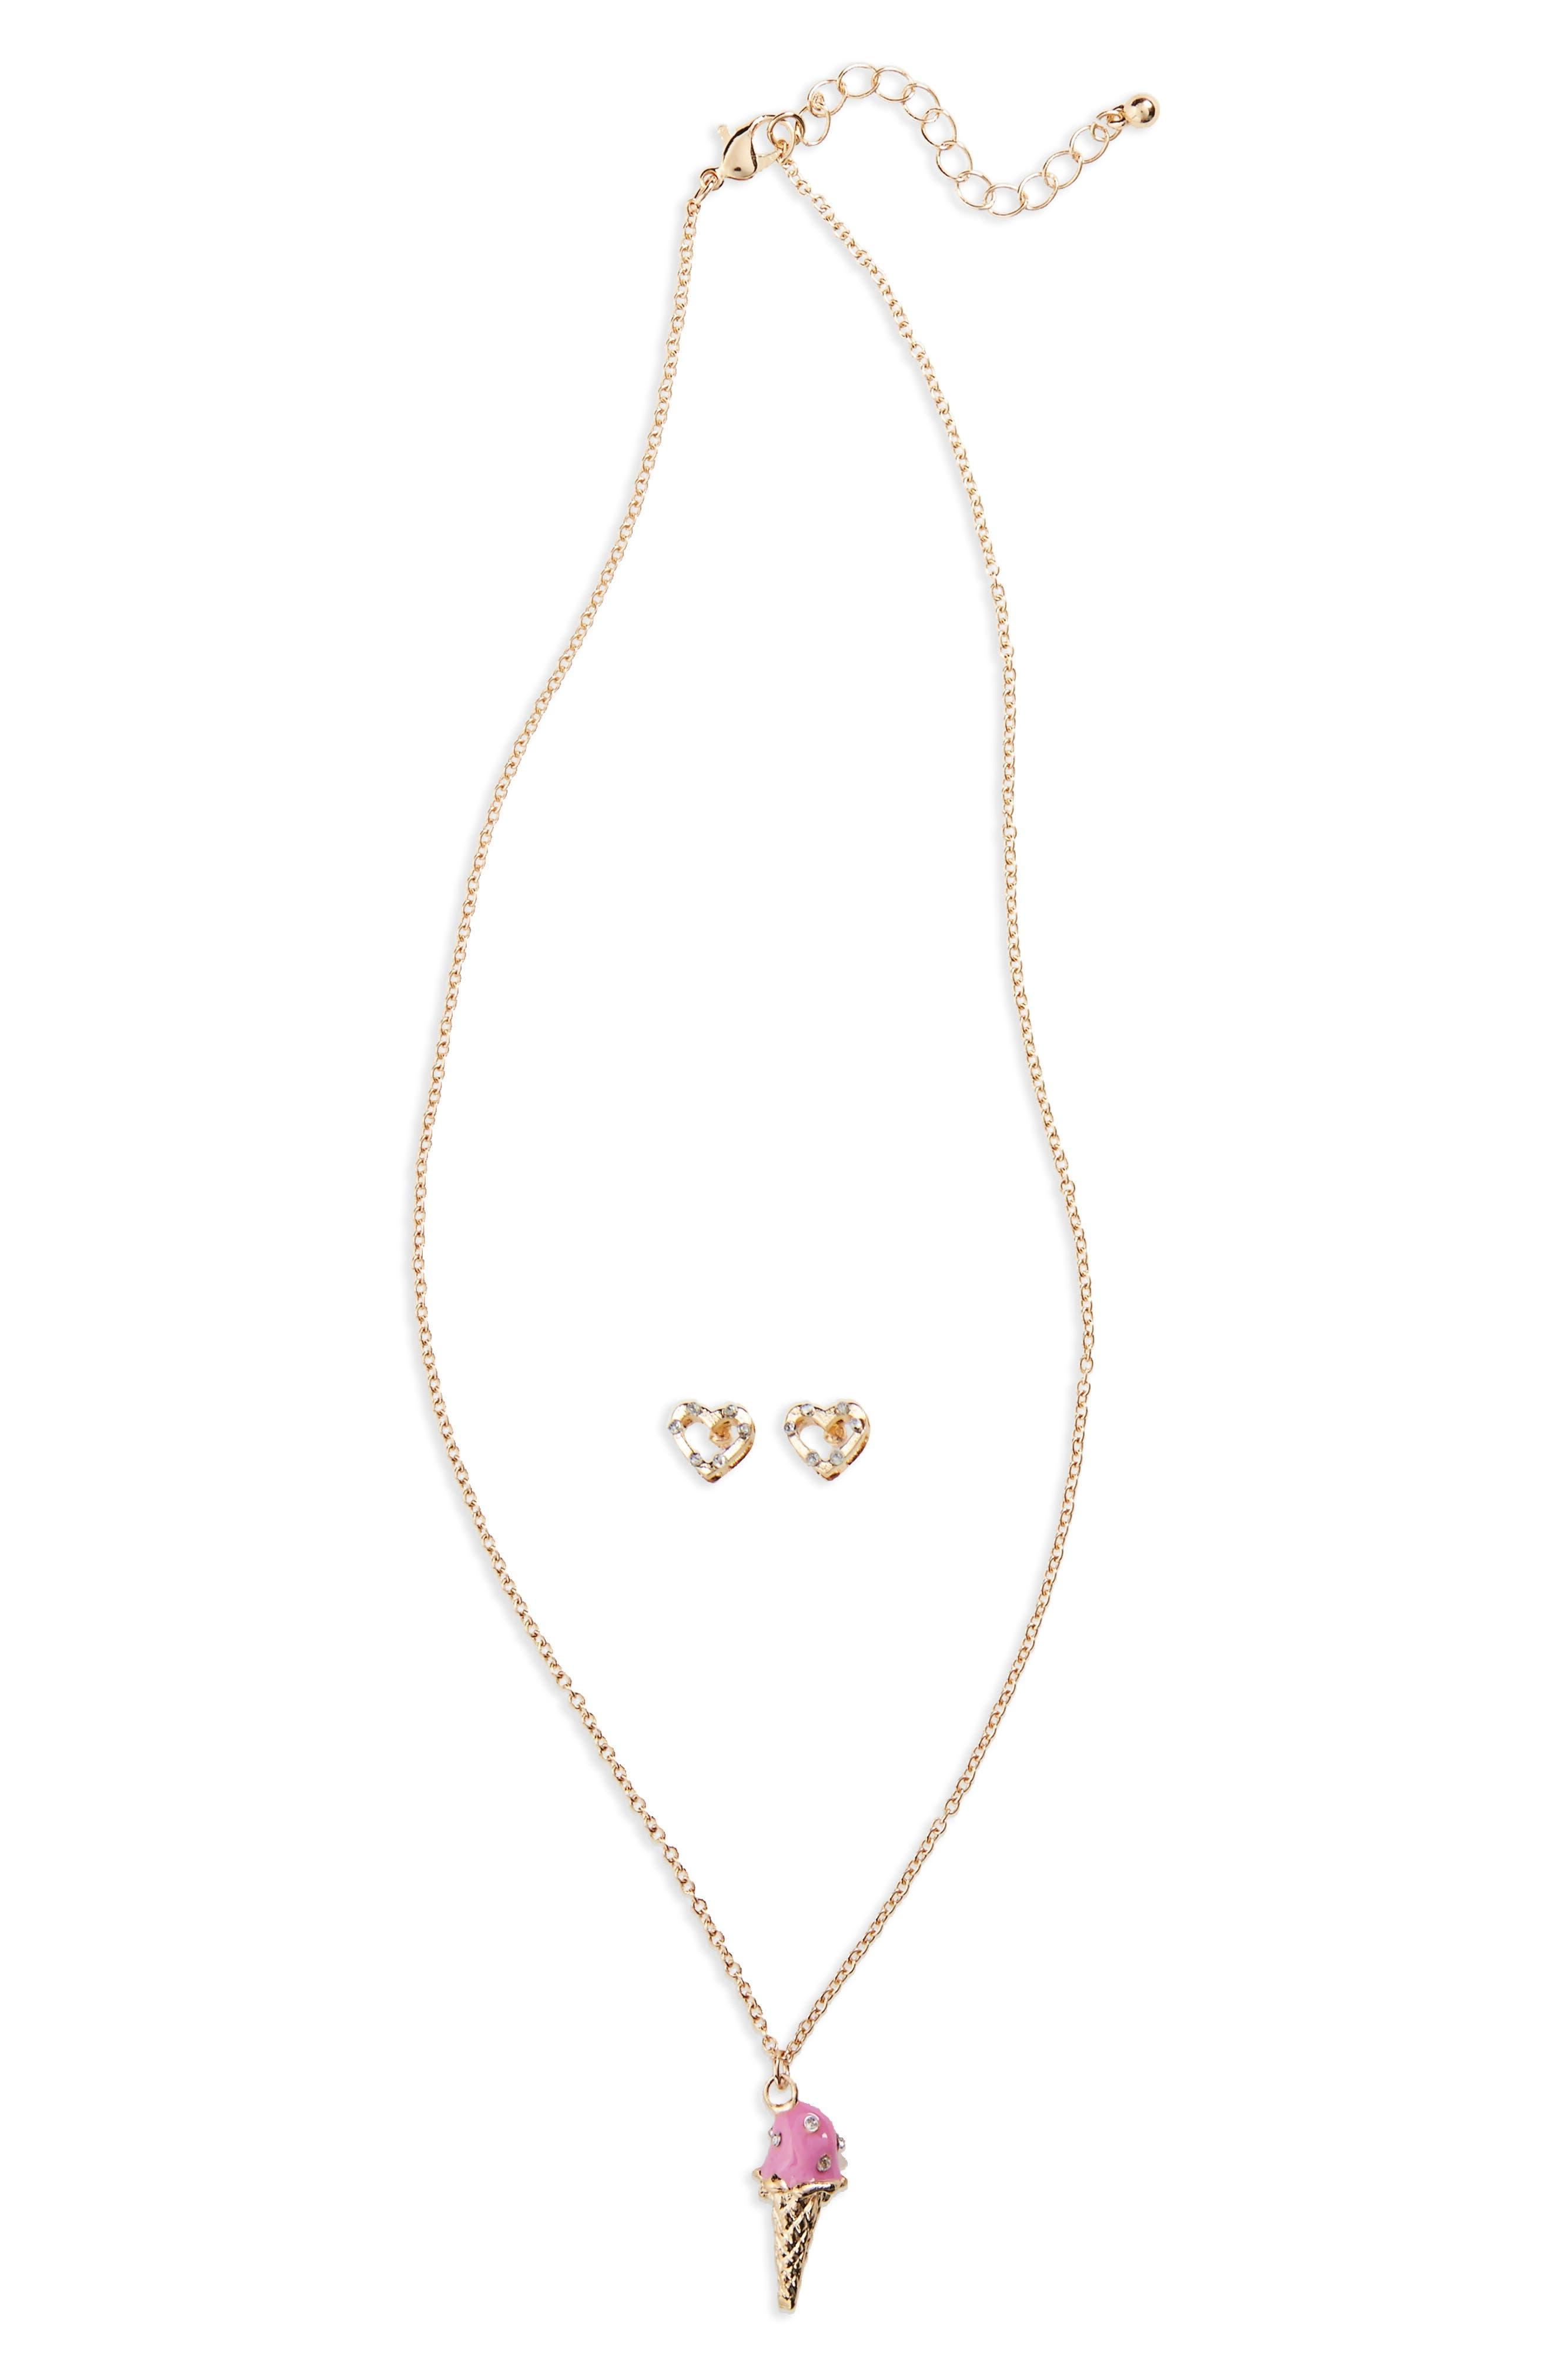 Main Image - Capelli New York Ice Cream Necklace & Heart Earrings Set (Big Girls)